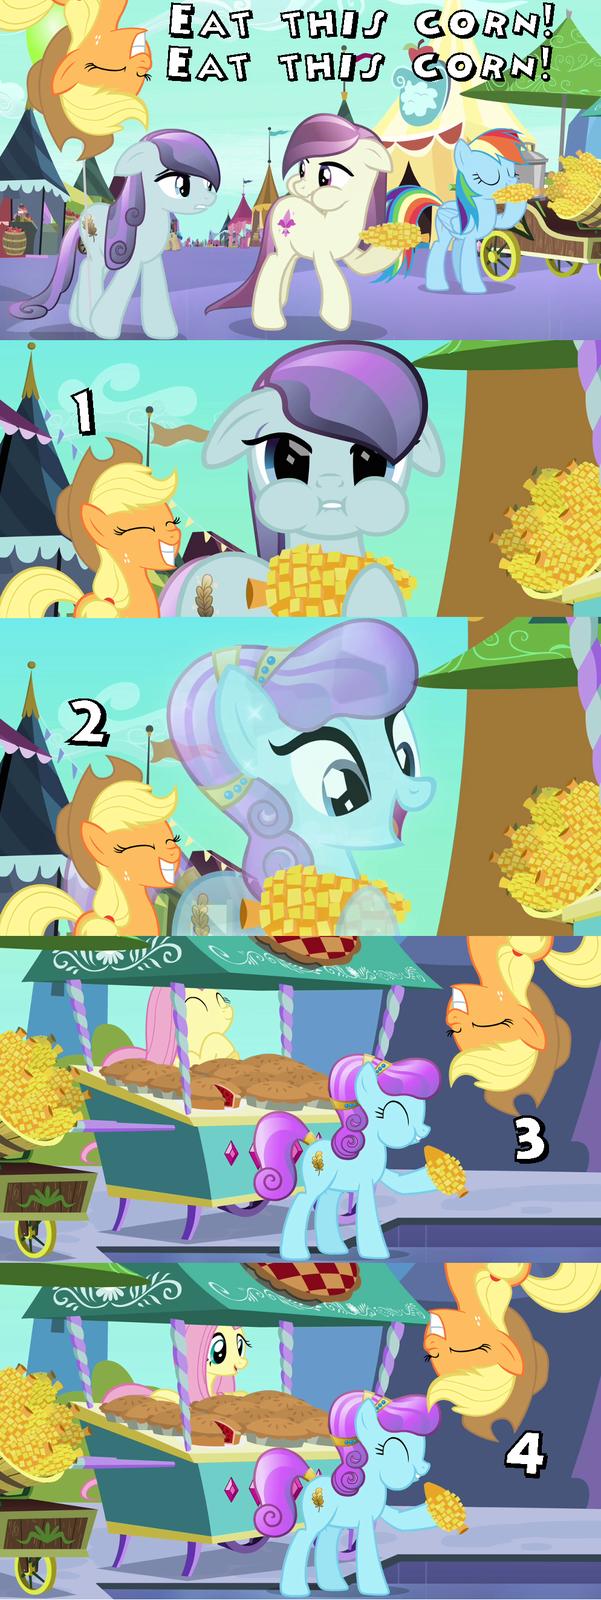 Eat this corn! Eat this corn! 1 2 3 4